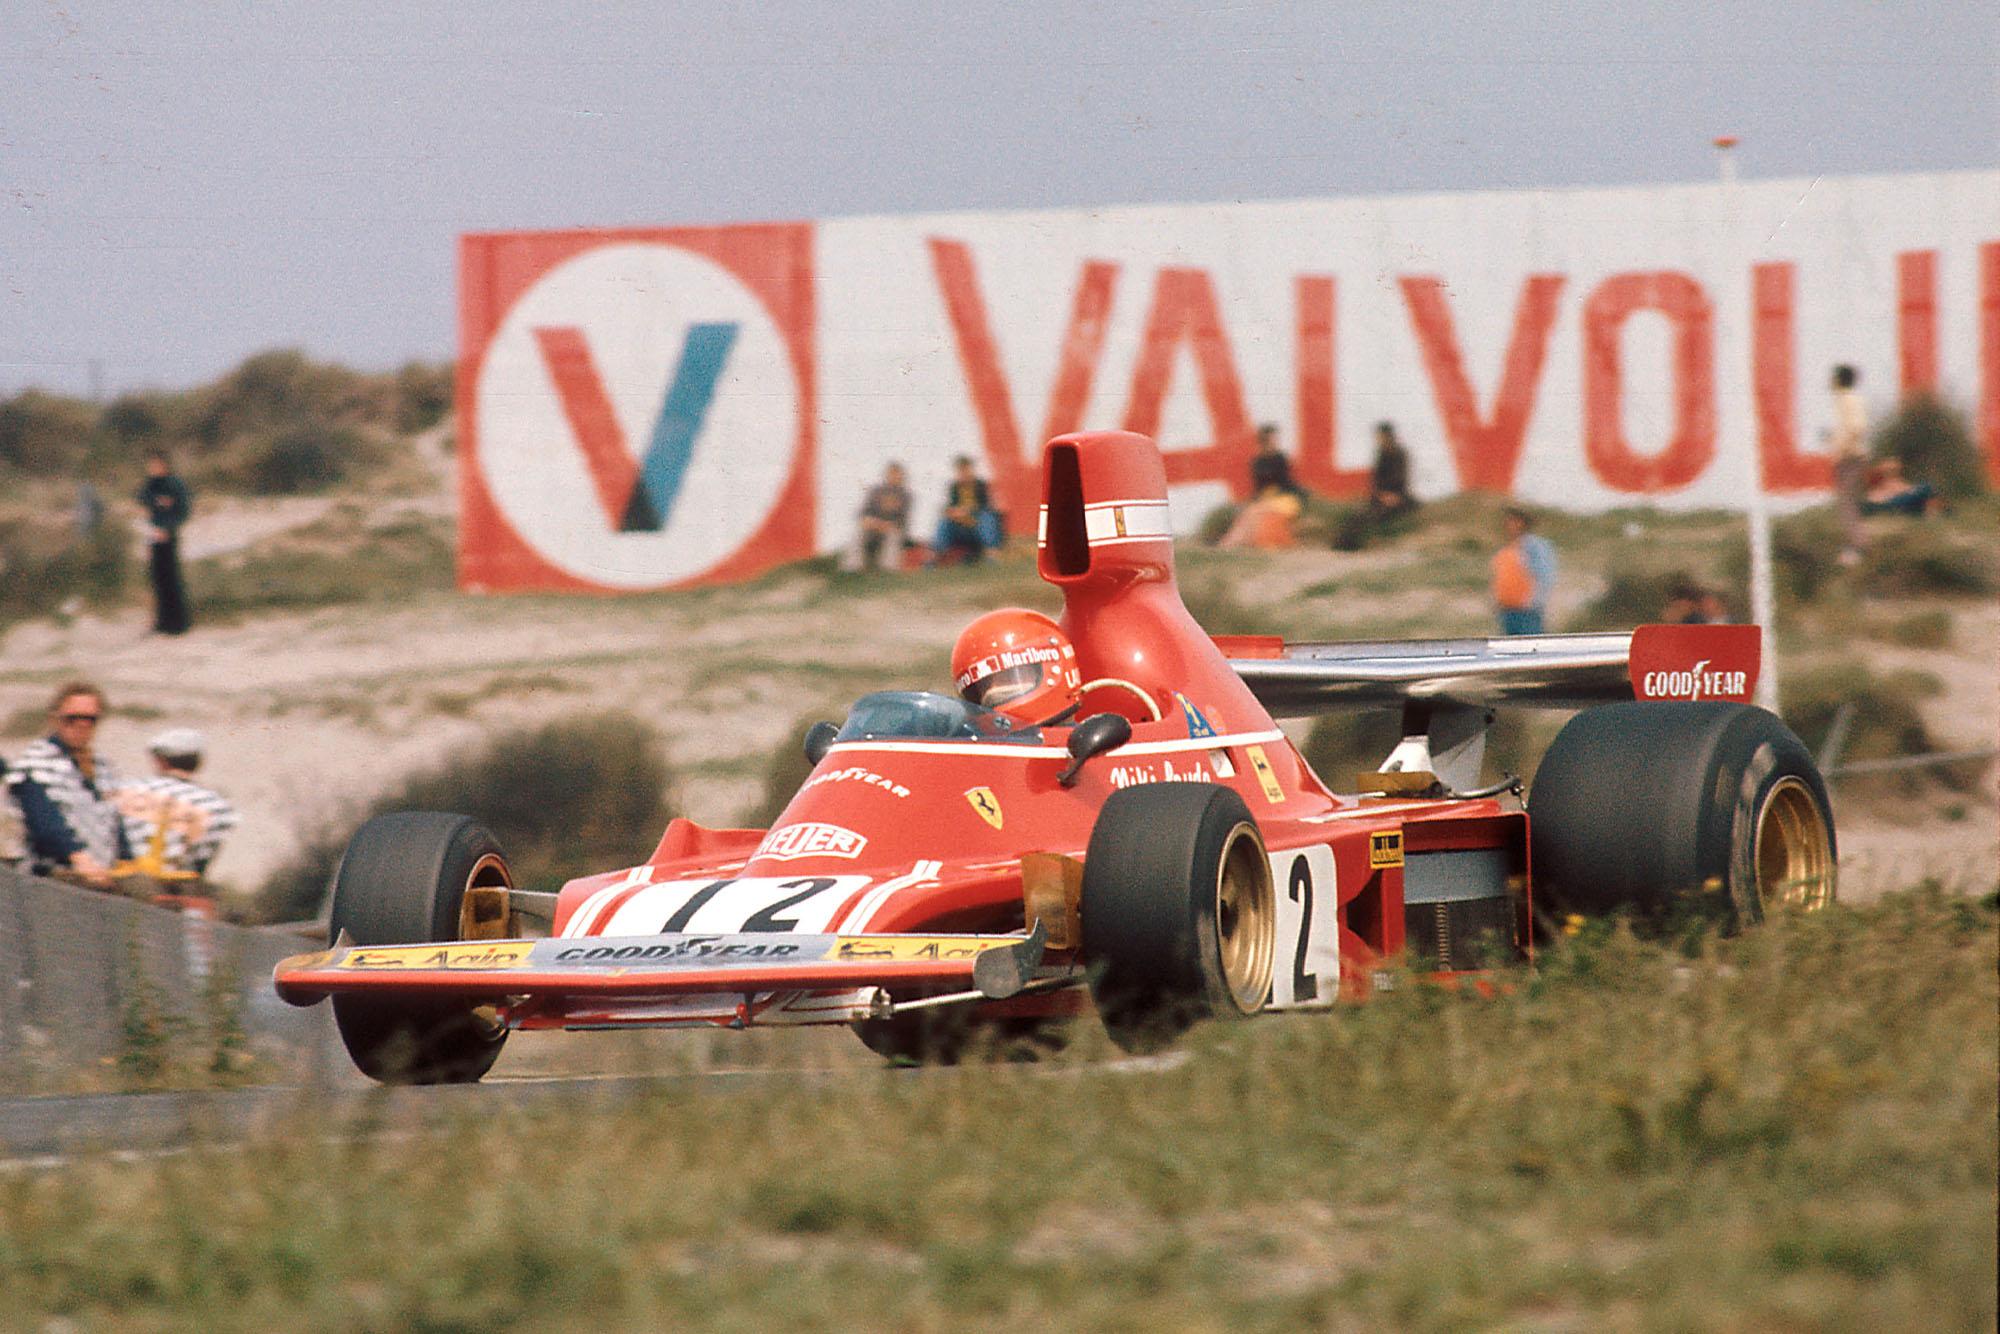 Niki Lauda (Ferrari) on his way to victory at the 1974 Dutch Grand Prix.